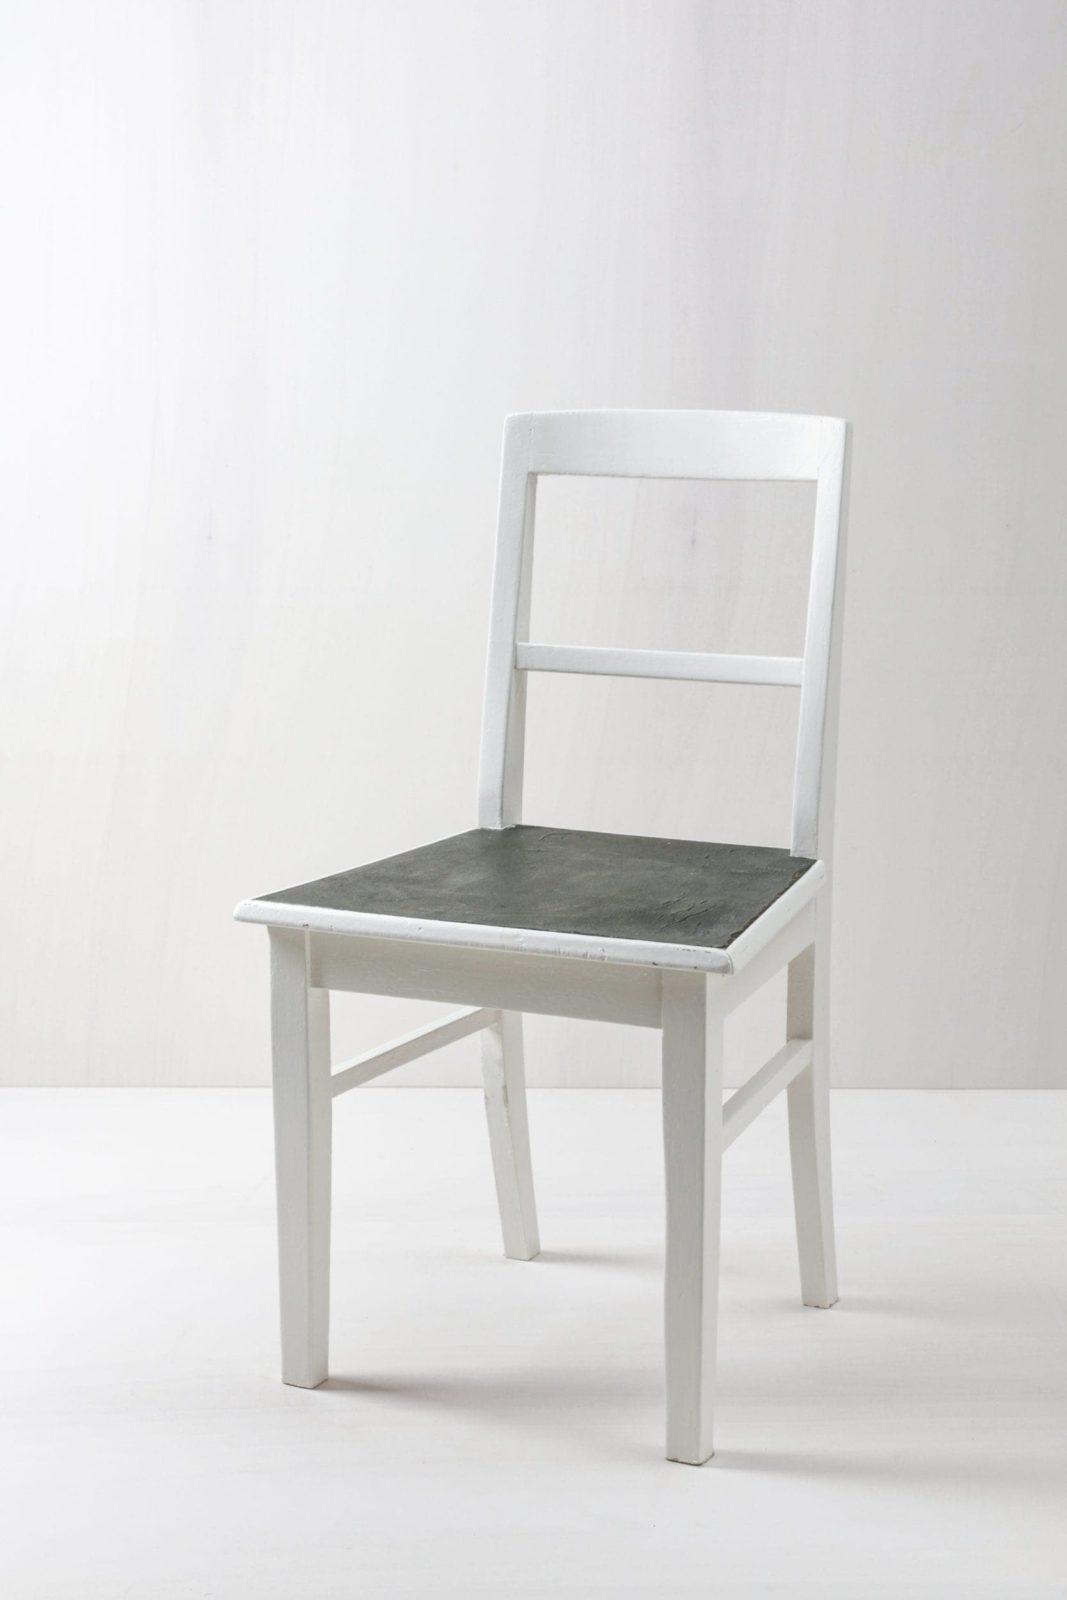 Kitchen Chair Josefina | Plain kitchen chair, grey seat, white finish. | gotvintage Rental & Event Design